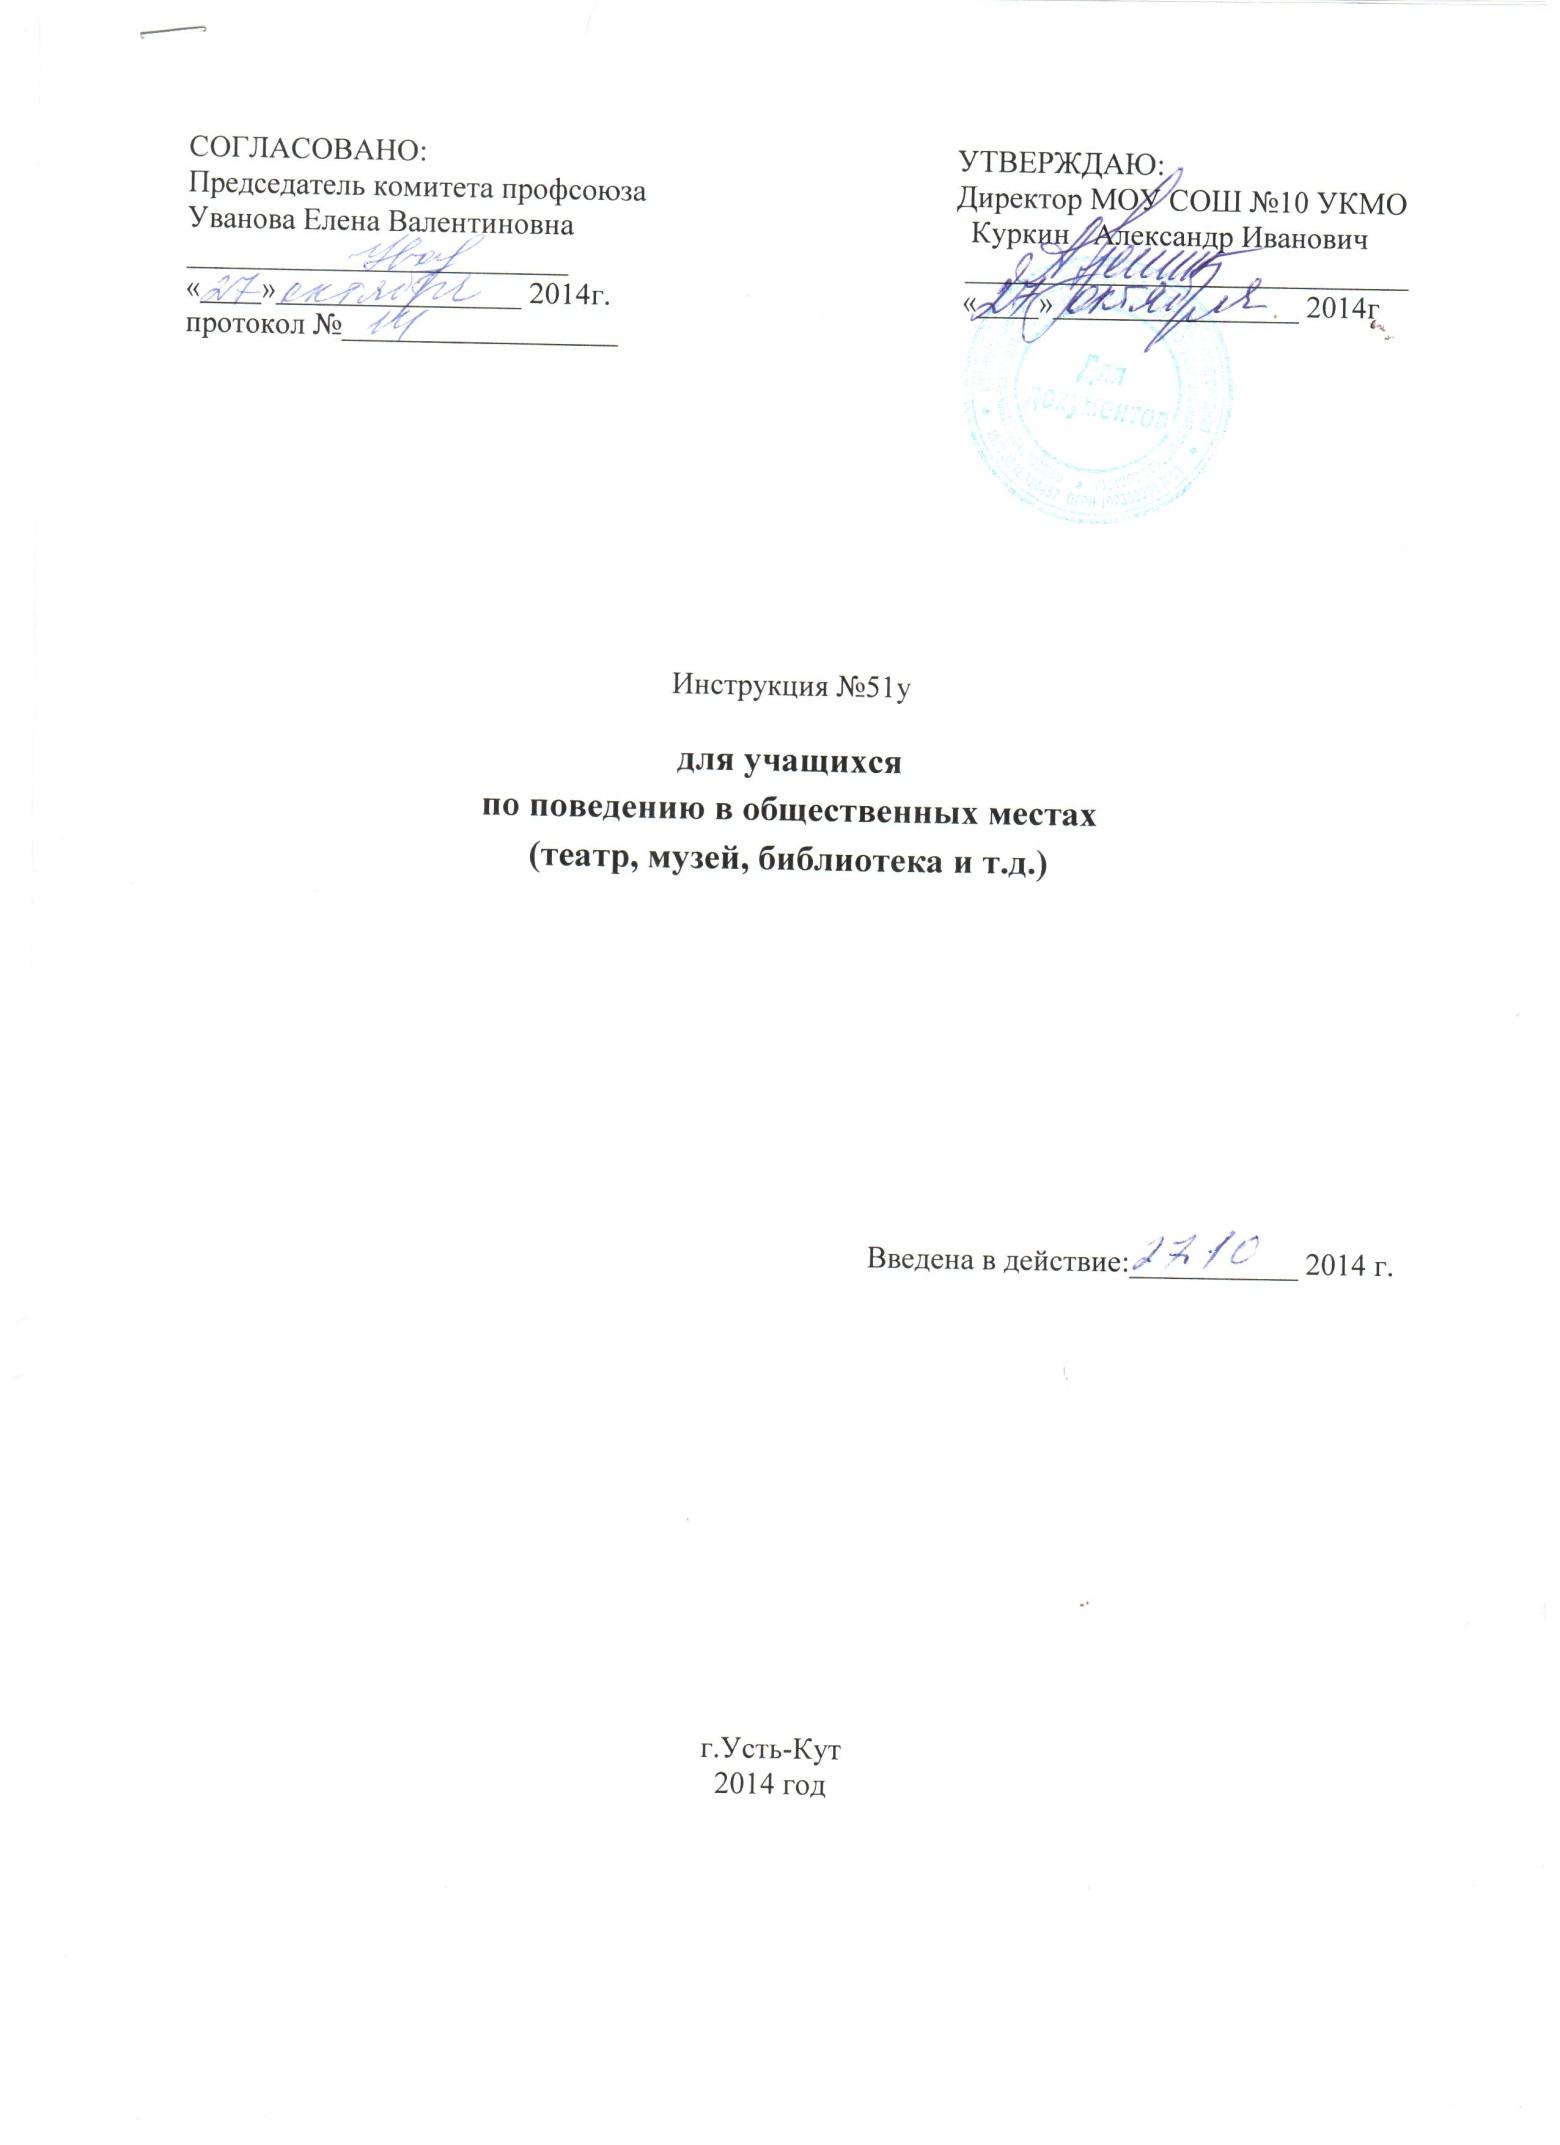 C:\Users\Admin\Documents\Scanned Documents\Рисунок (29).jpg